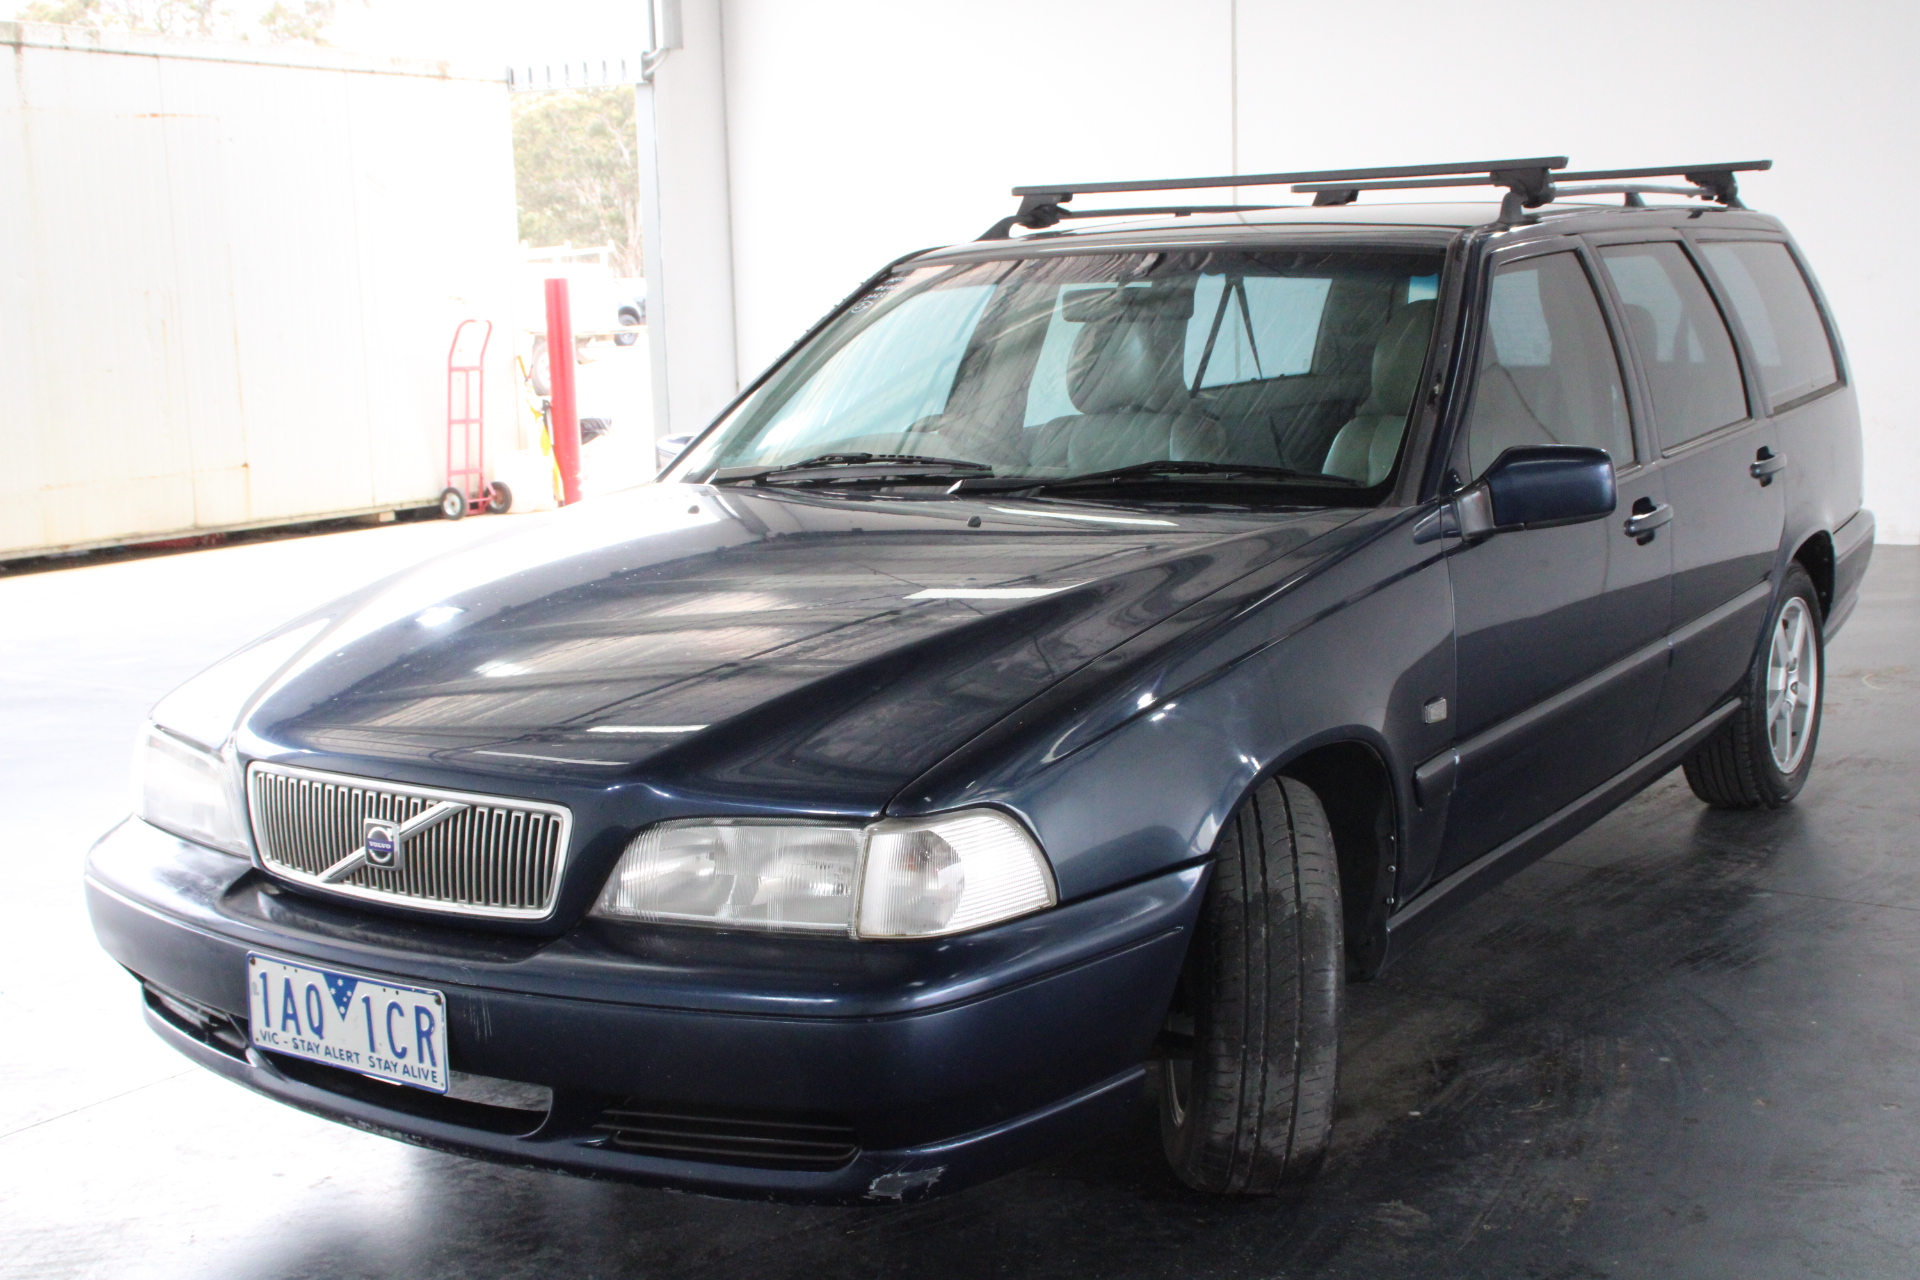 1999 Volvo V70 2.5 20V Automatic 7 Seats Wagon